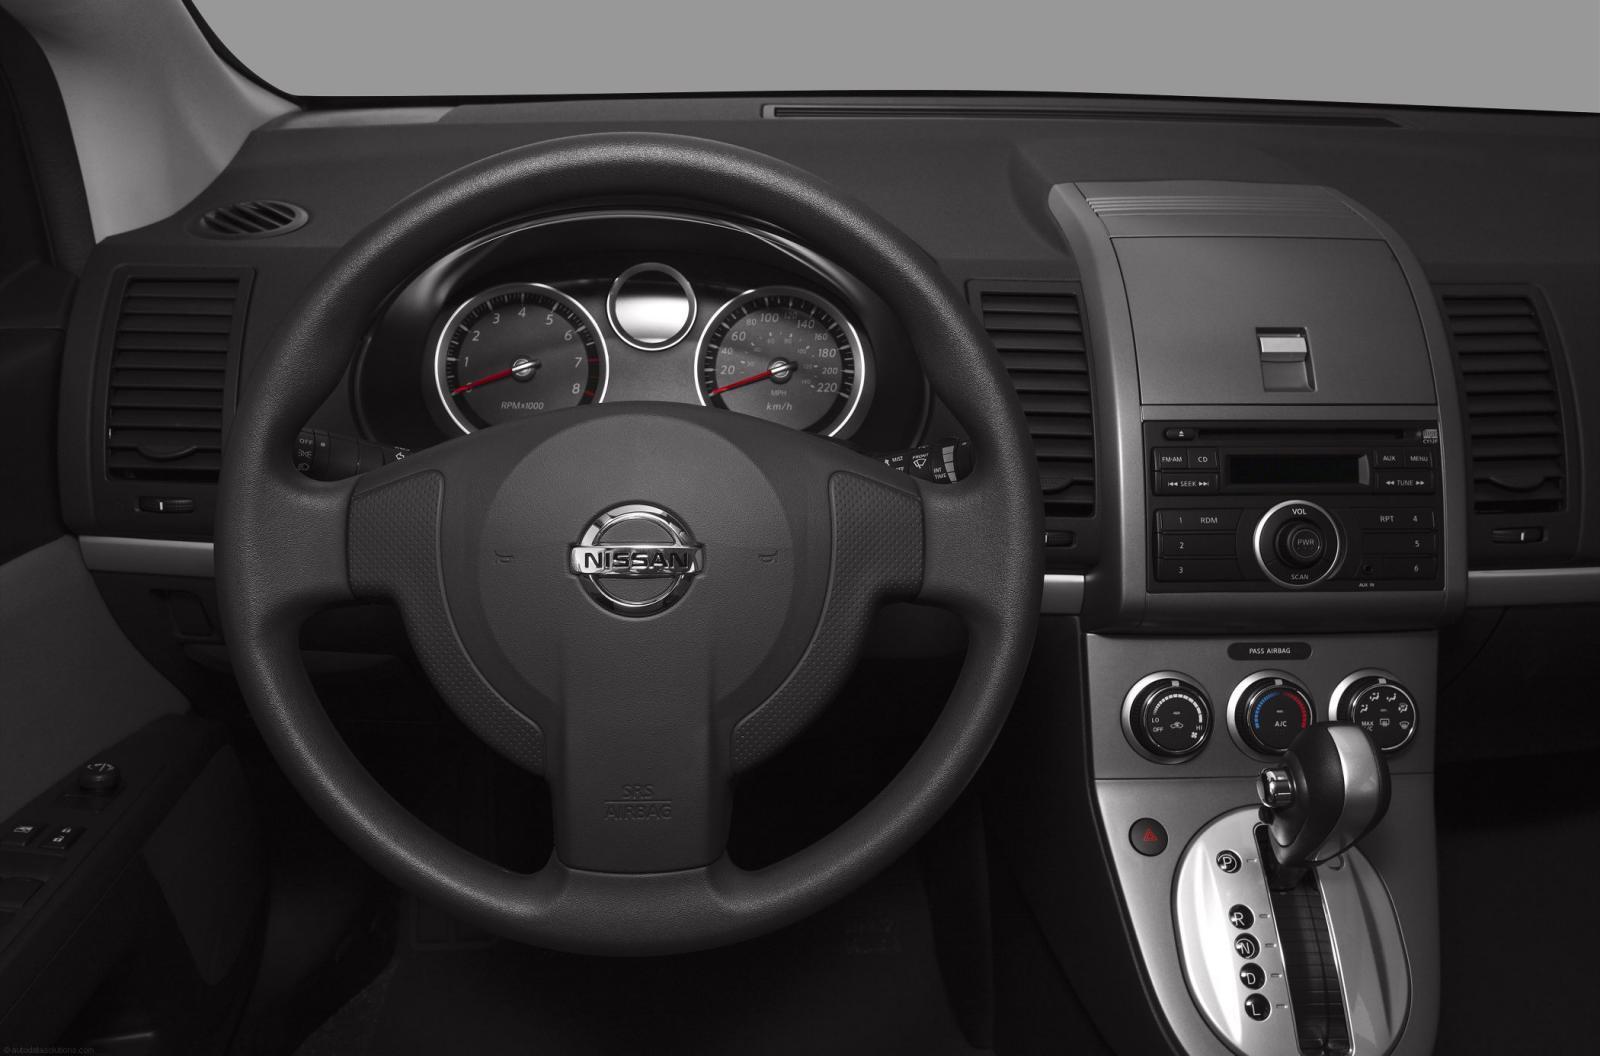 2011 Nissan Sentra - Information and photos - Zomb Drive